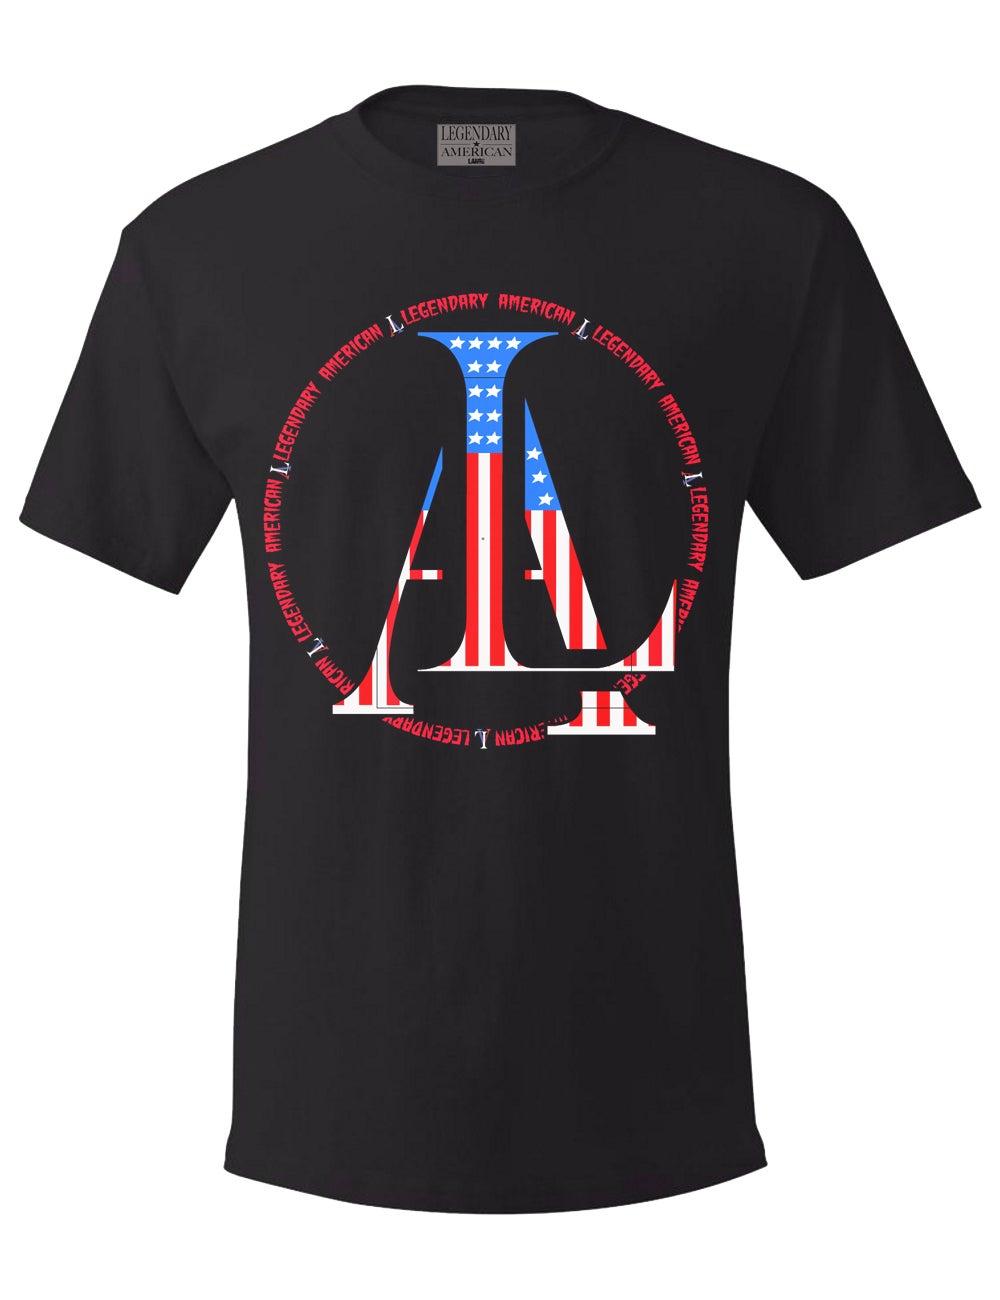 Image of Legendary American LA logo tee